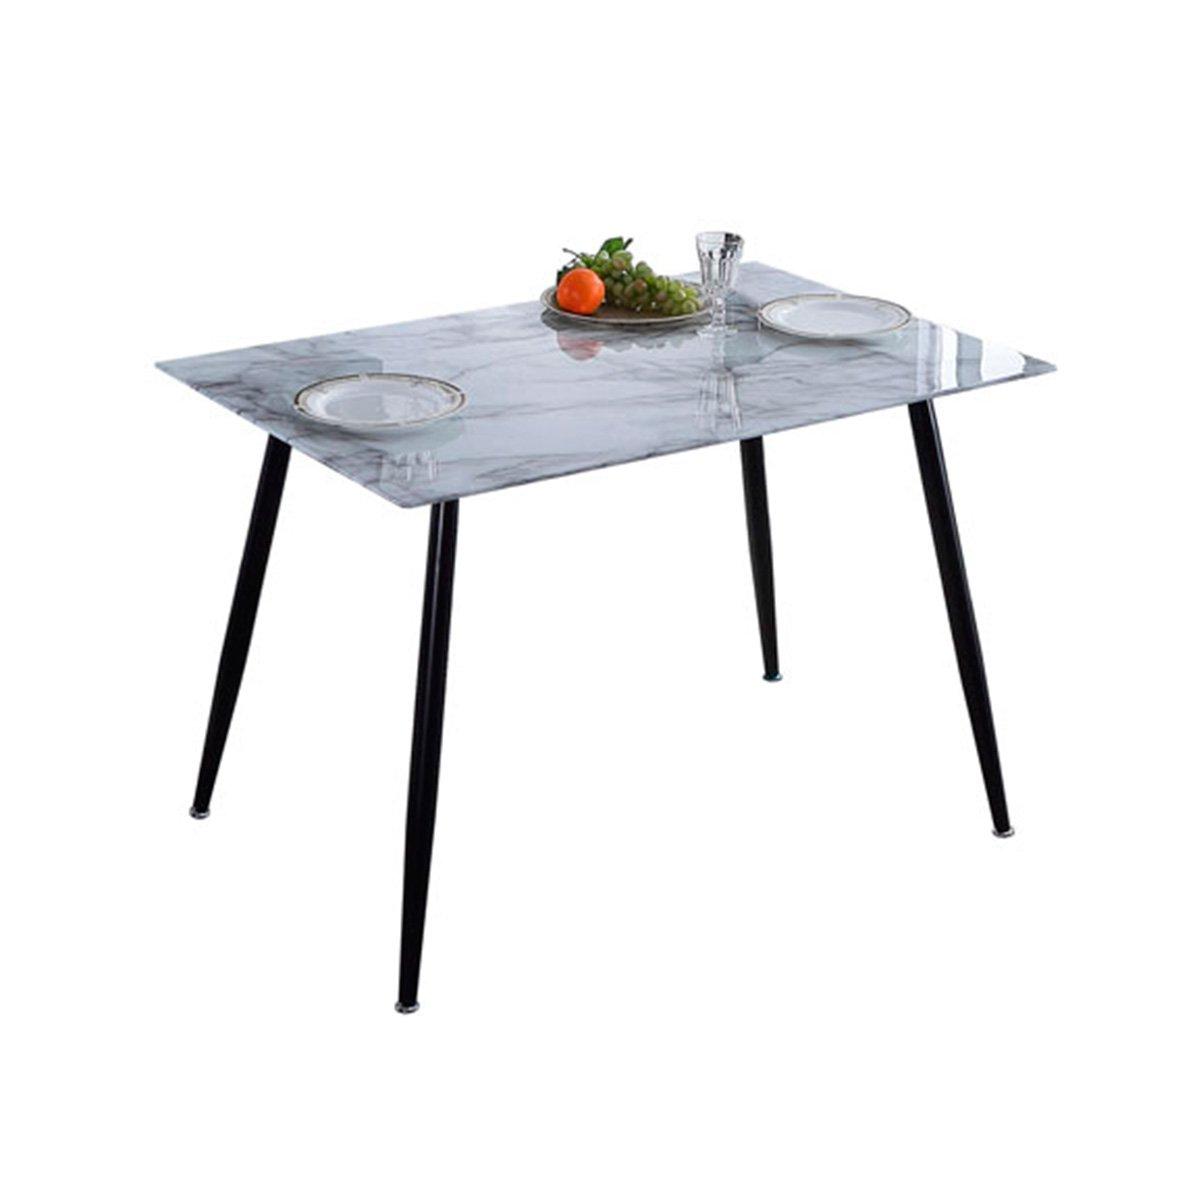 Mesa comedor cristal efecto marmol patas negro mate 120cm.